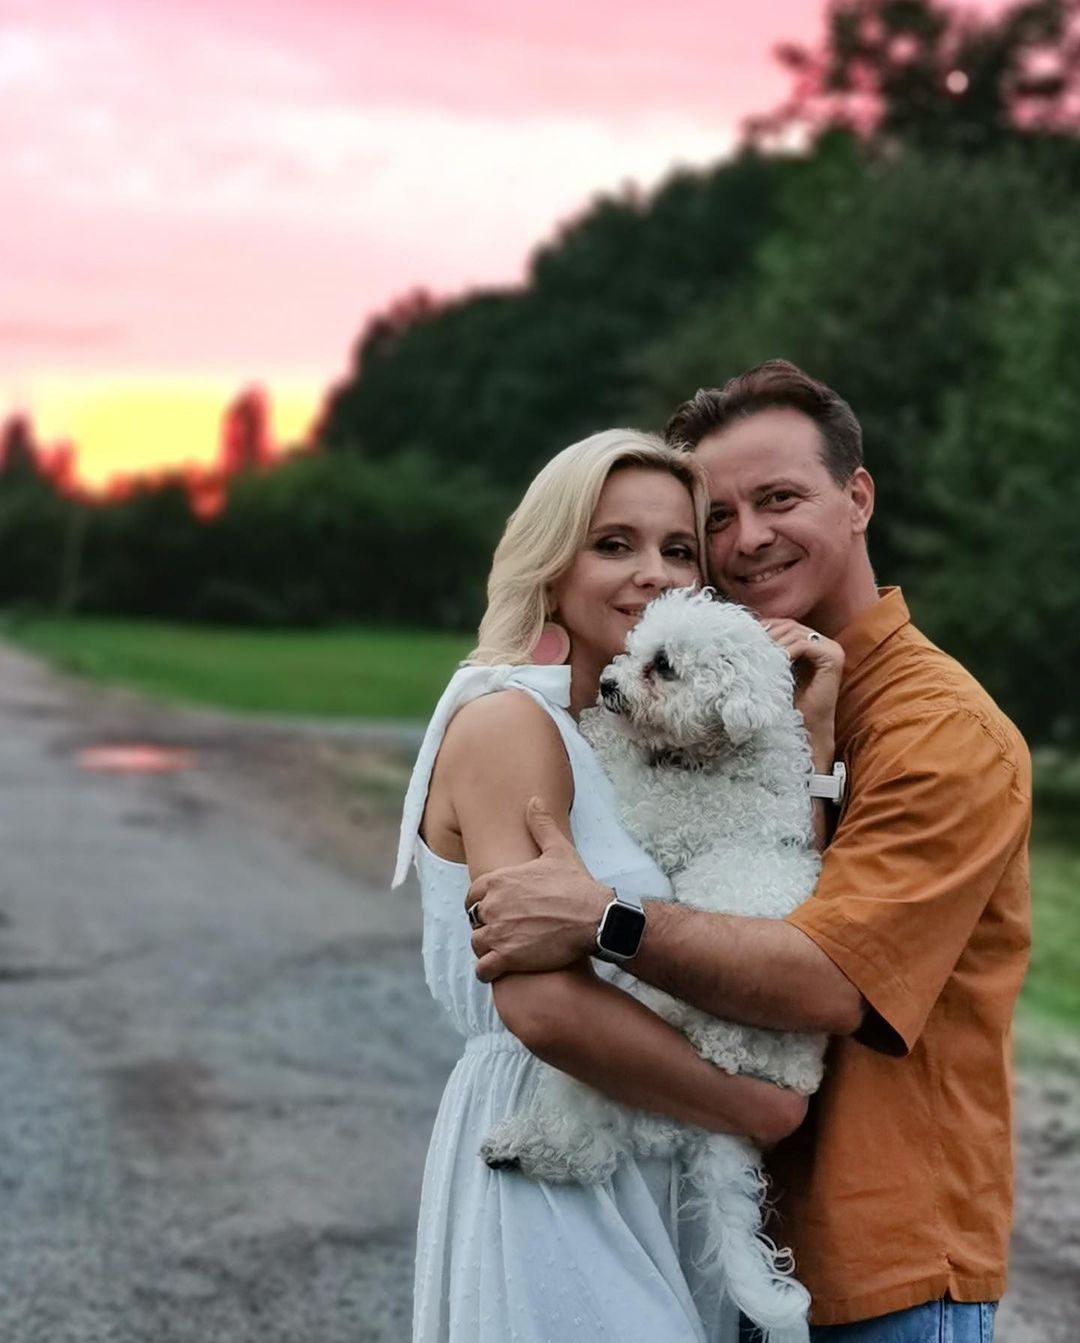 В объятиях любимого: Лилия Ребрик покорила нежностью с мужем на фоне яркого заката